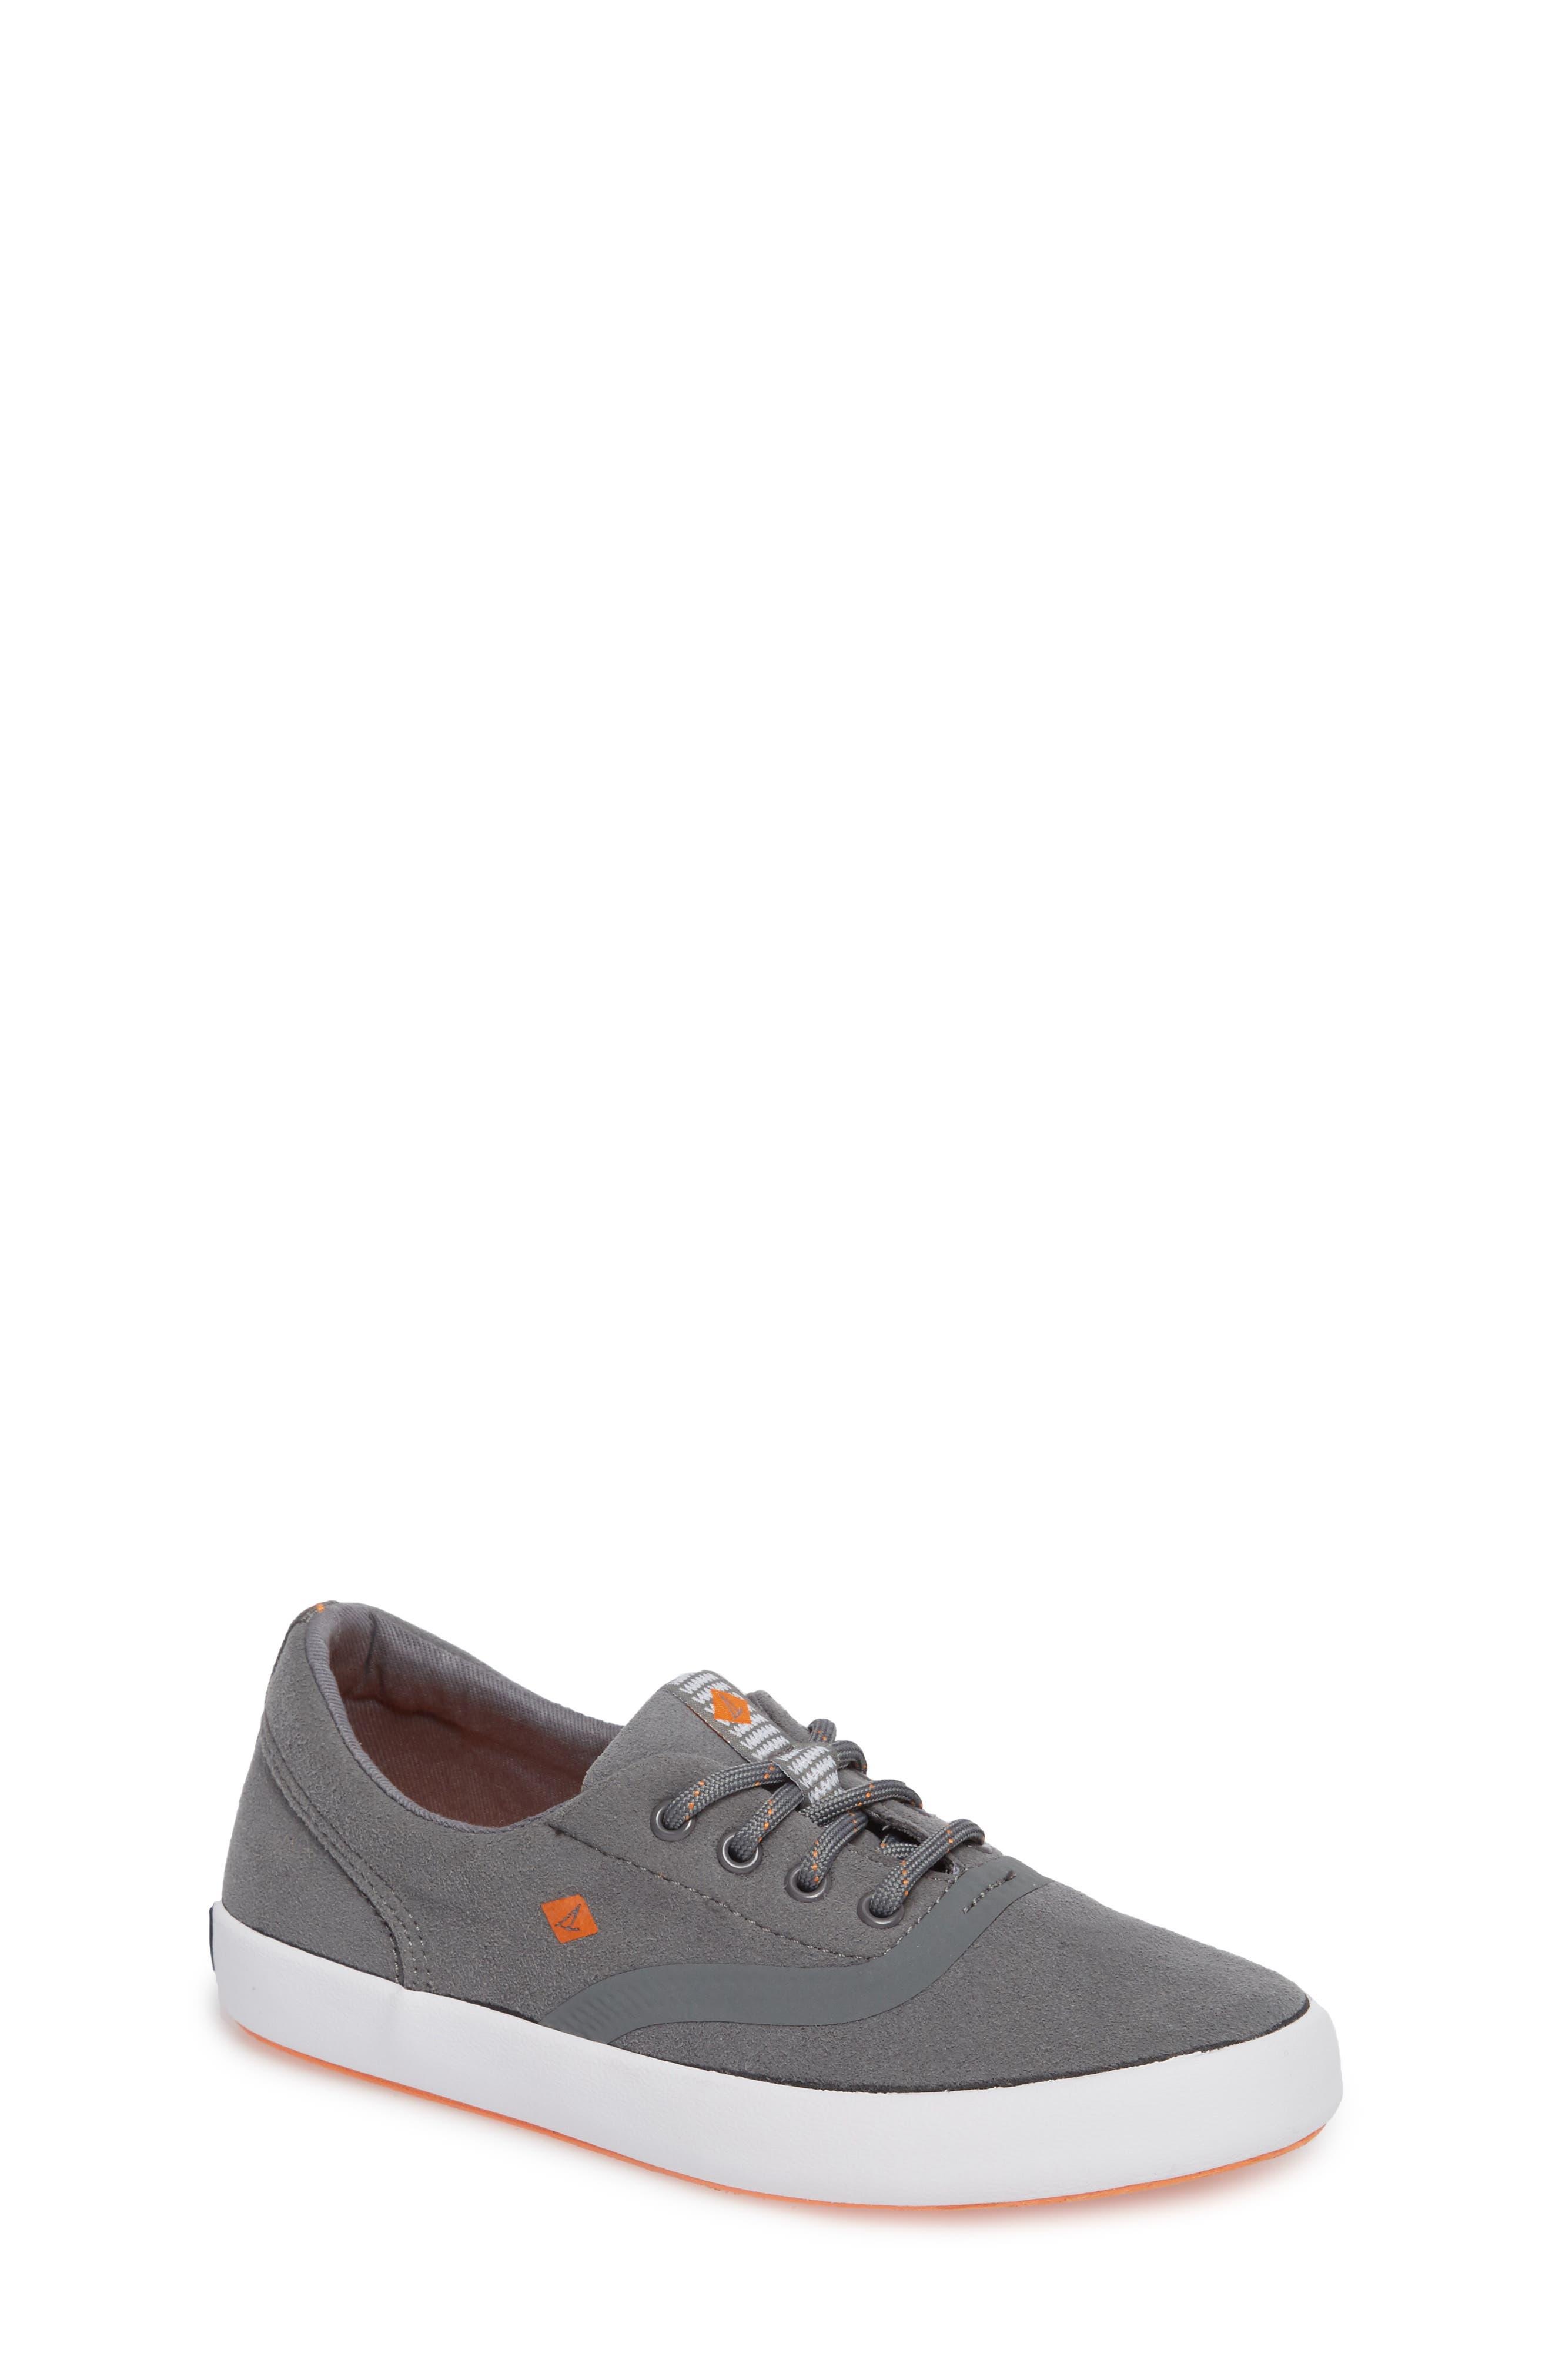 Wahoo Sneaker,                             Main thumbnail 1, color,                             020